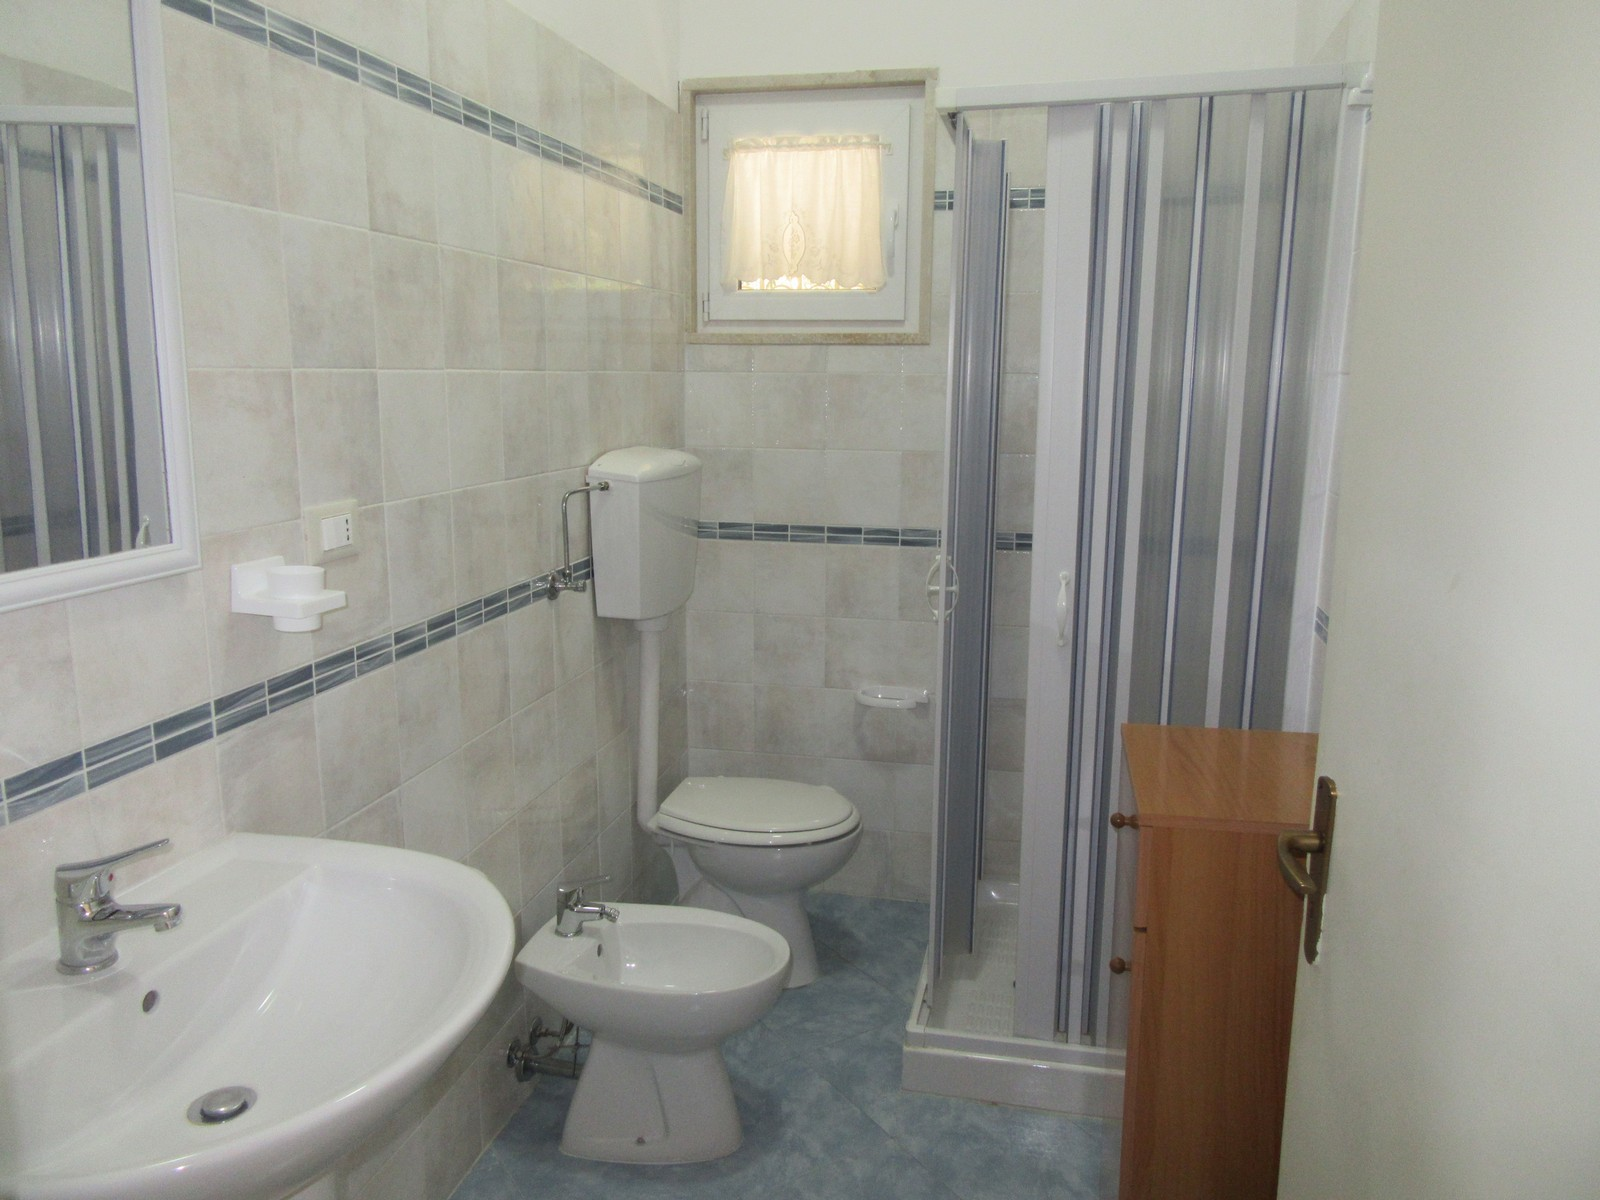 Ferienhaus Villa Mariposa n°1 , only 100 mt from the beach (2354065), Porto Cesareo, Lecce, Apulien, Italien, Bild 7